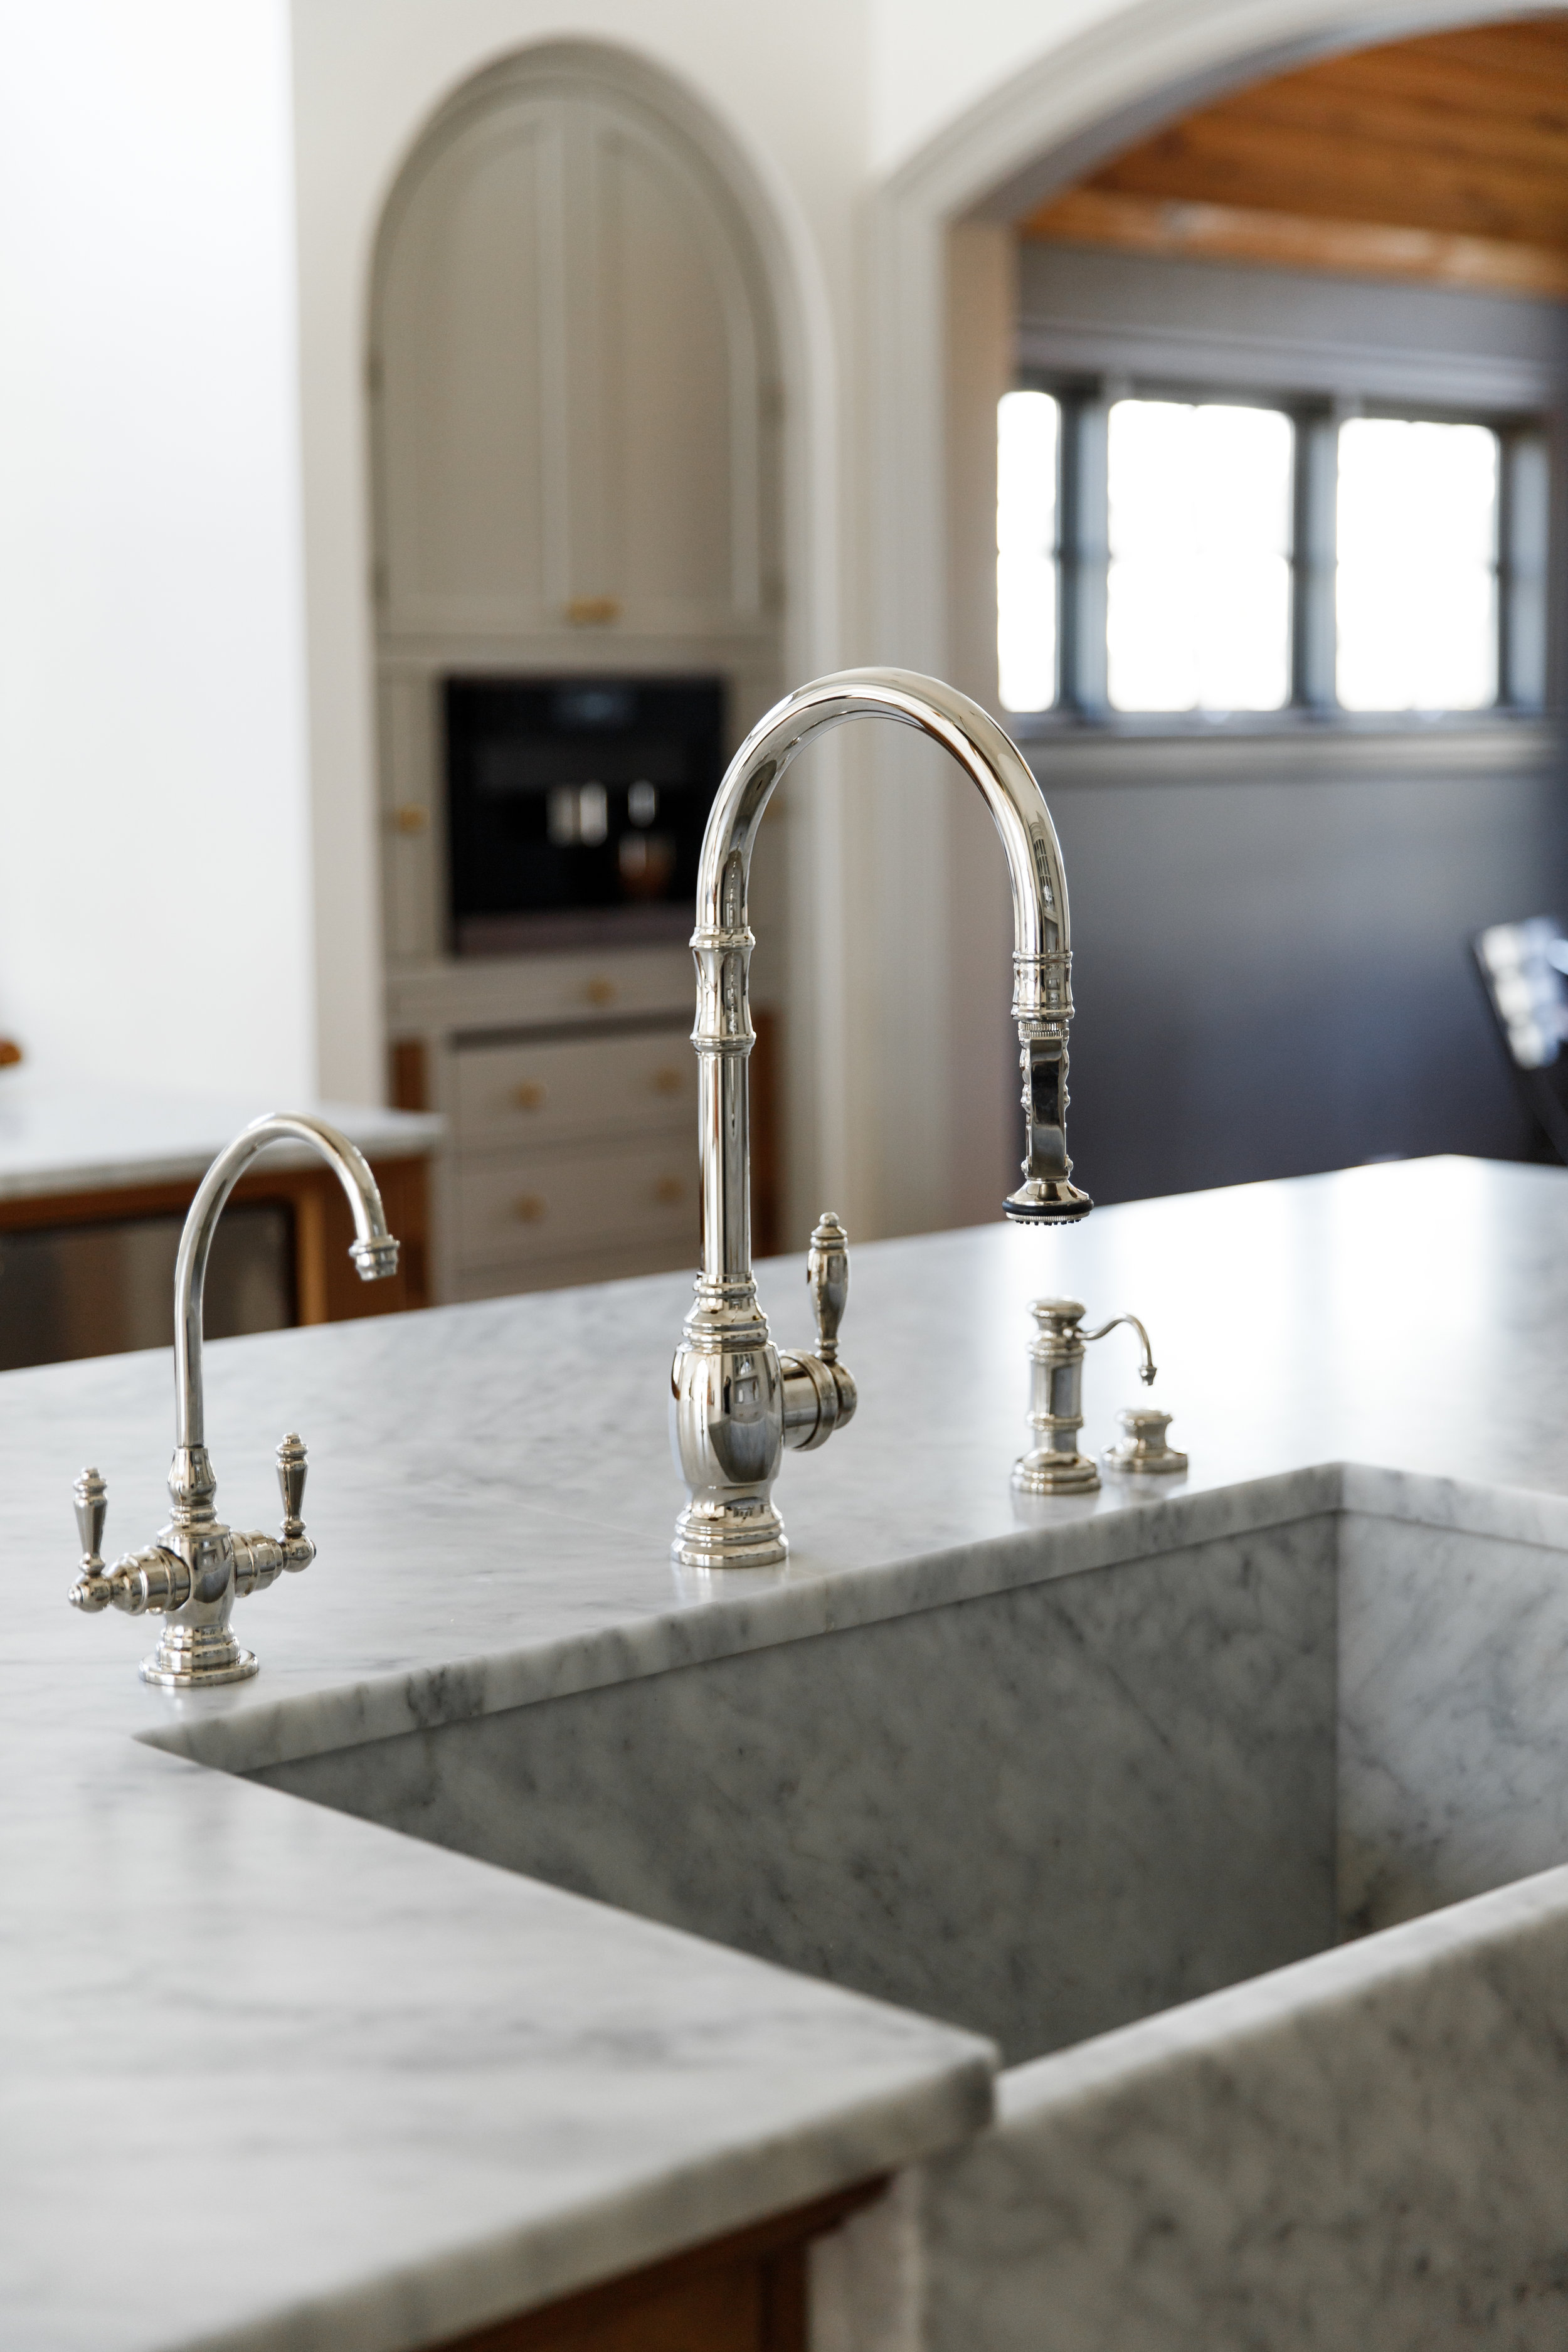 Large single bowl marble sink